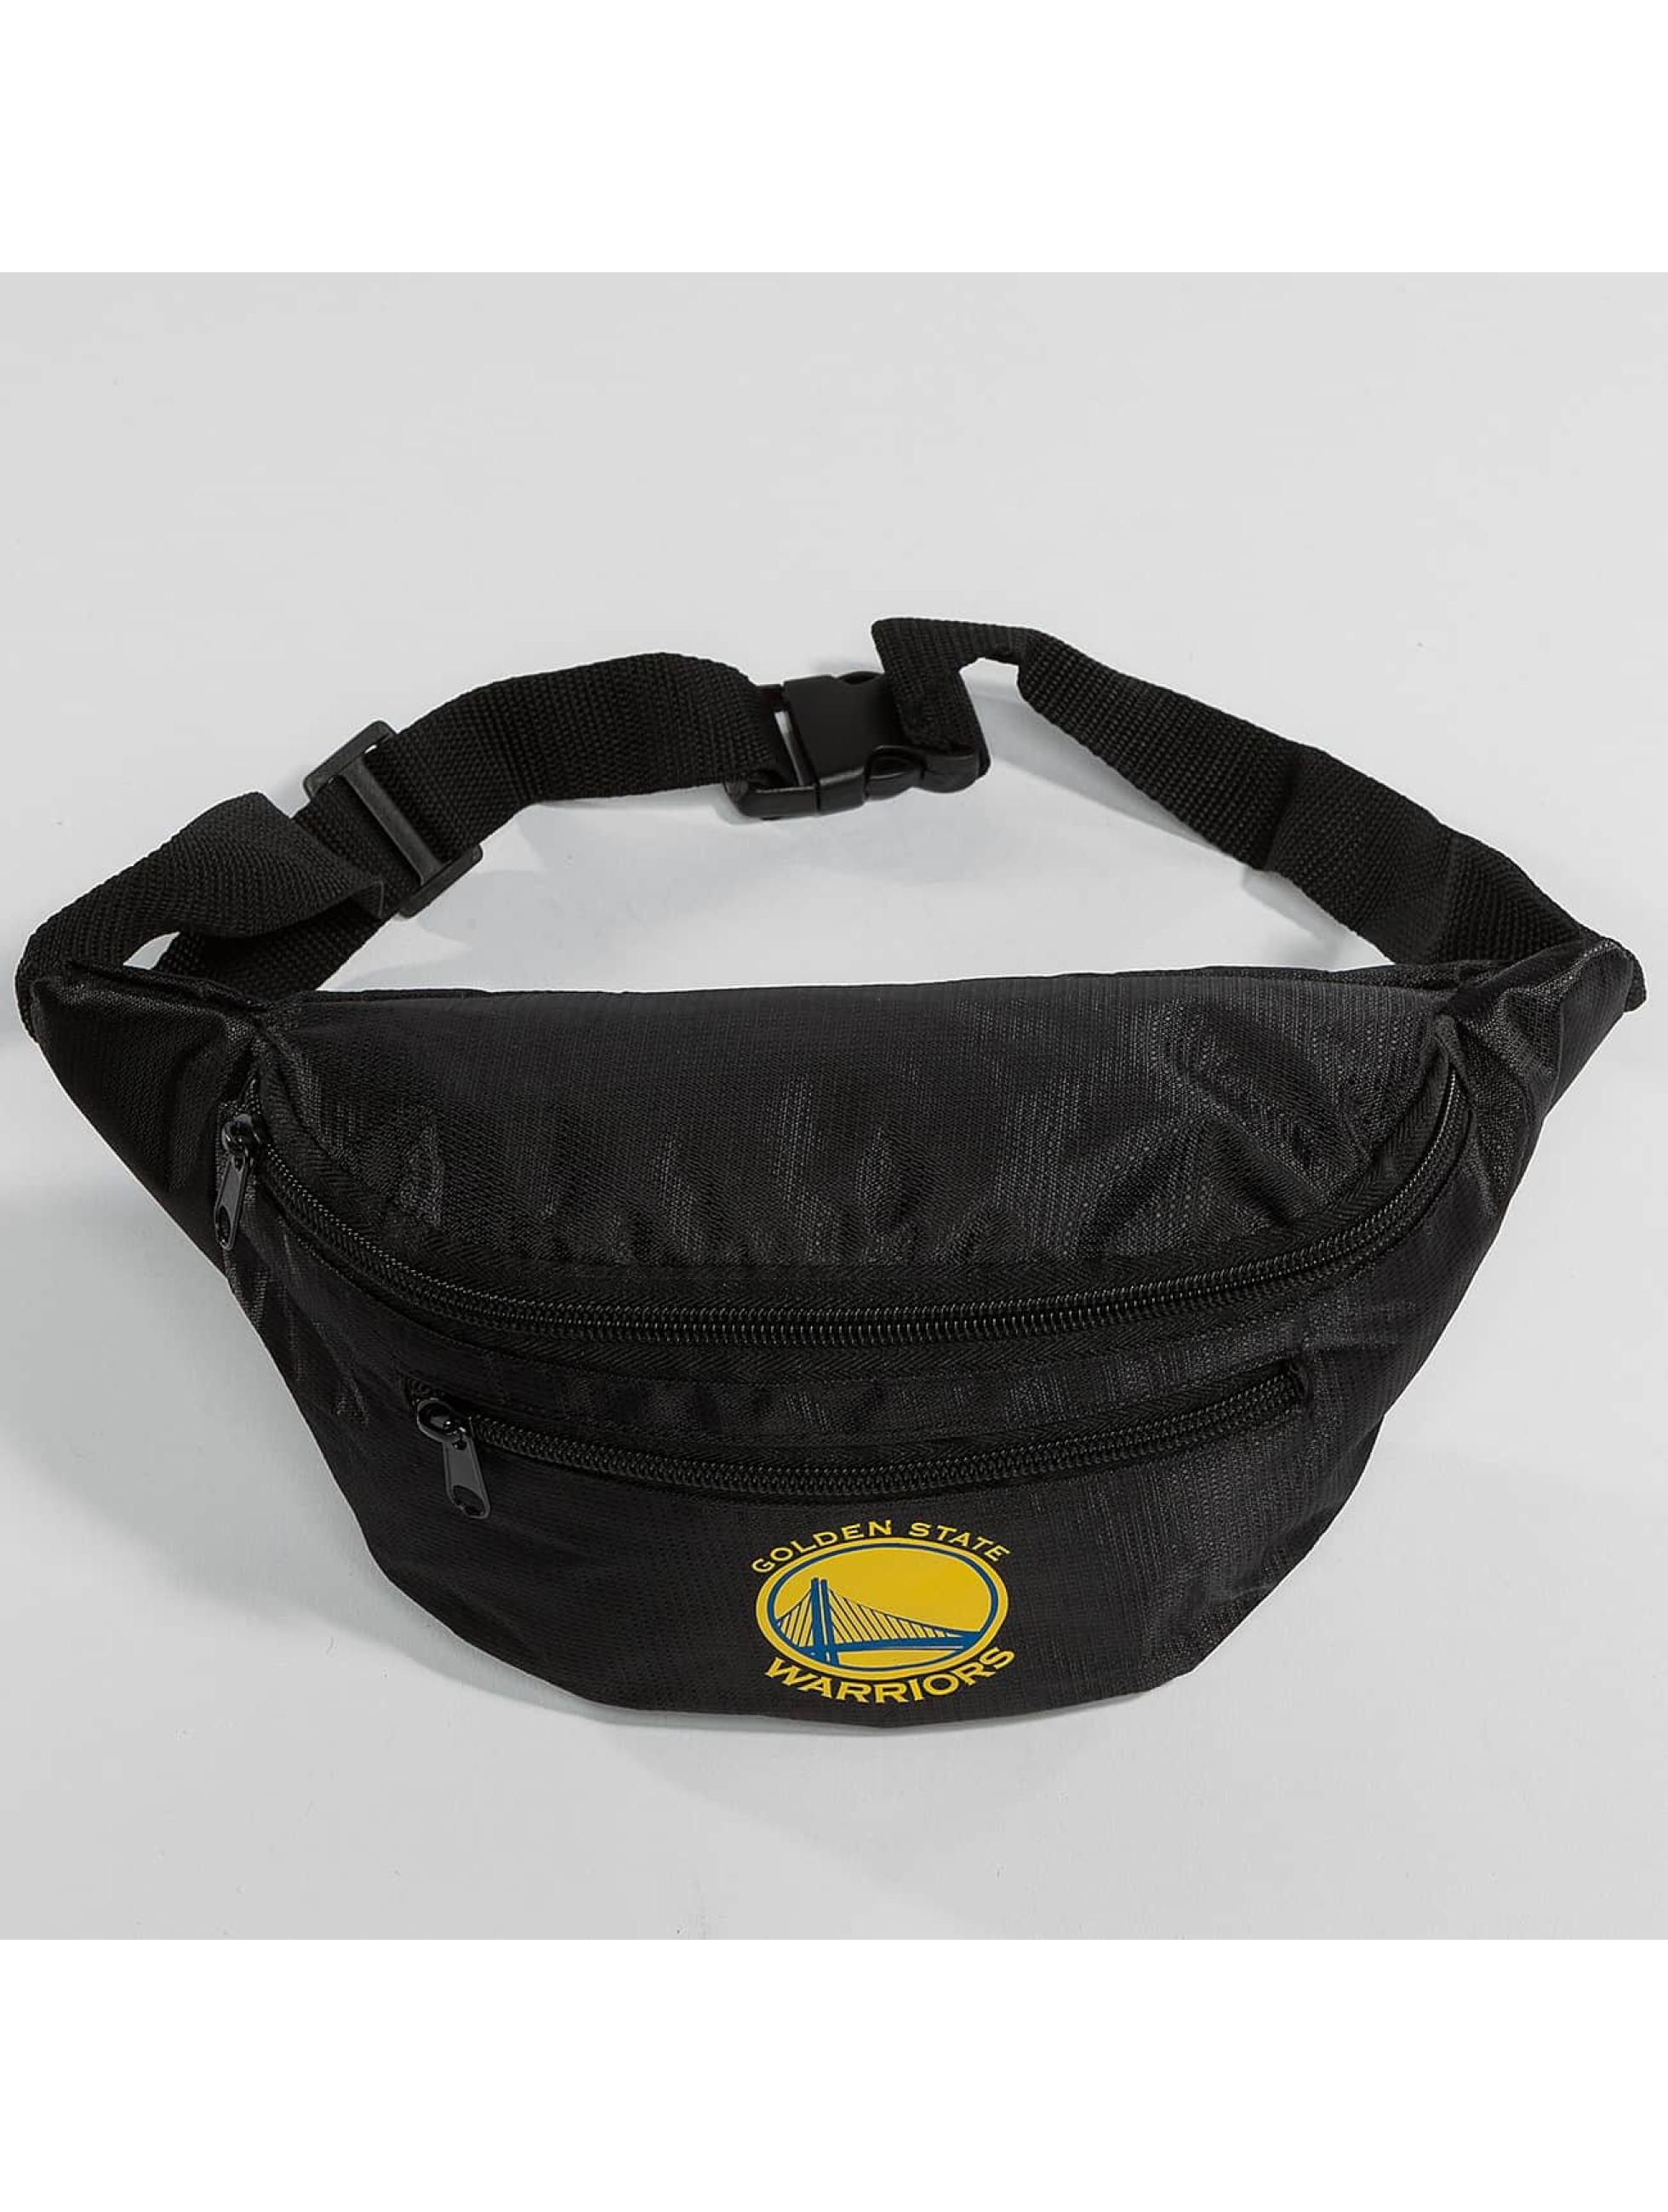 Forever Collectibles Sac NBA Golden State Warriors noir